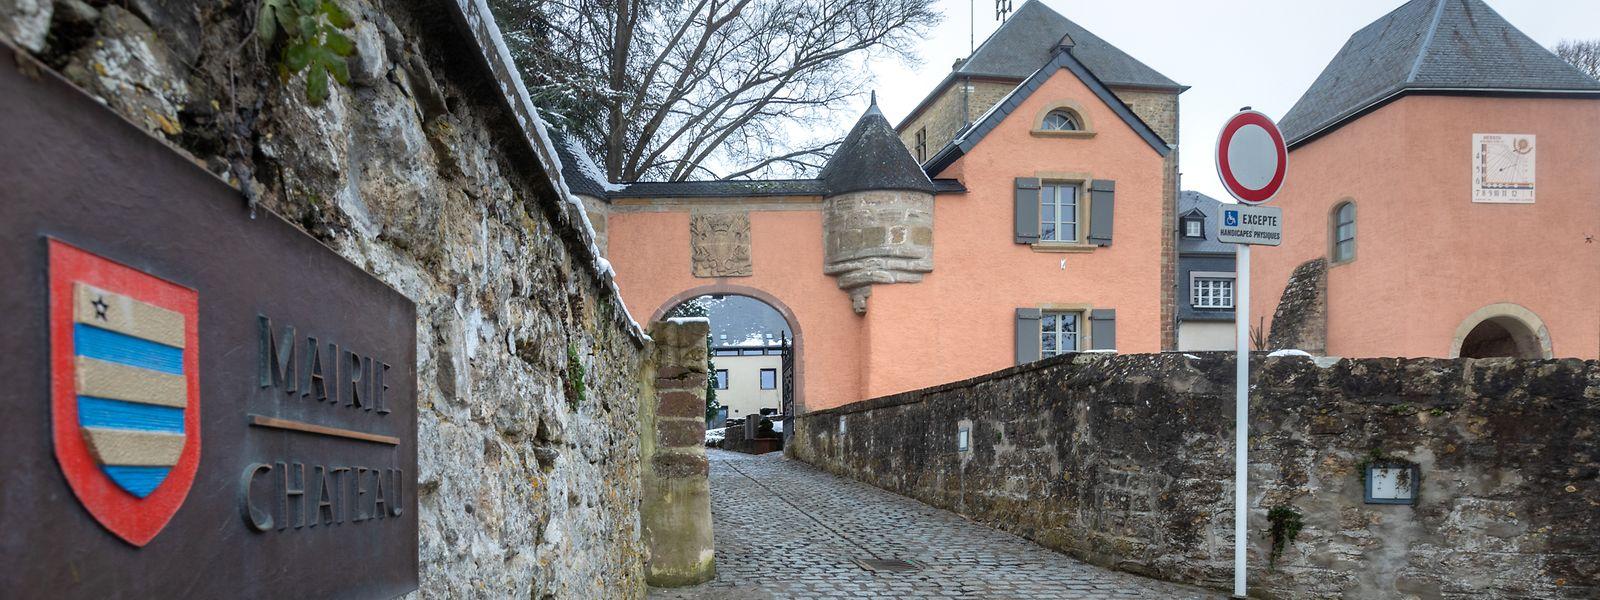 Das gesamte Areal samt dem Schloss, dem Turm und der Kapelle ist seit 1980 denkmalgeschützt.